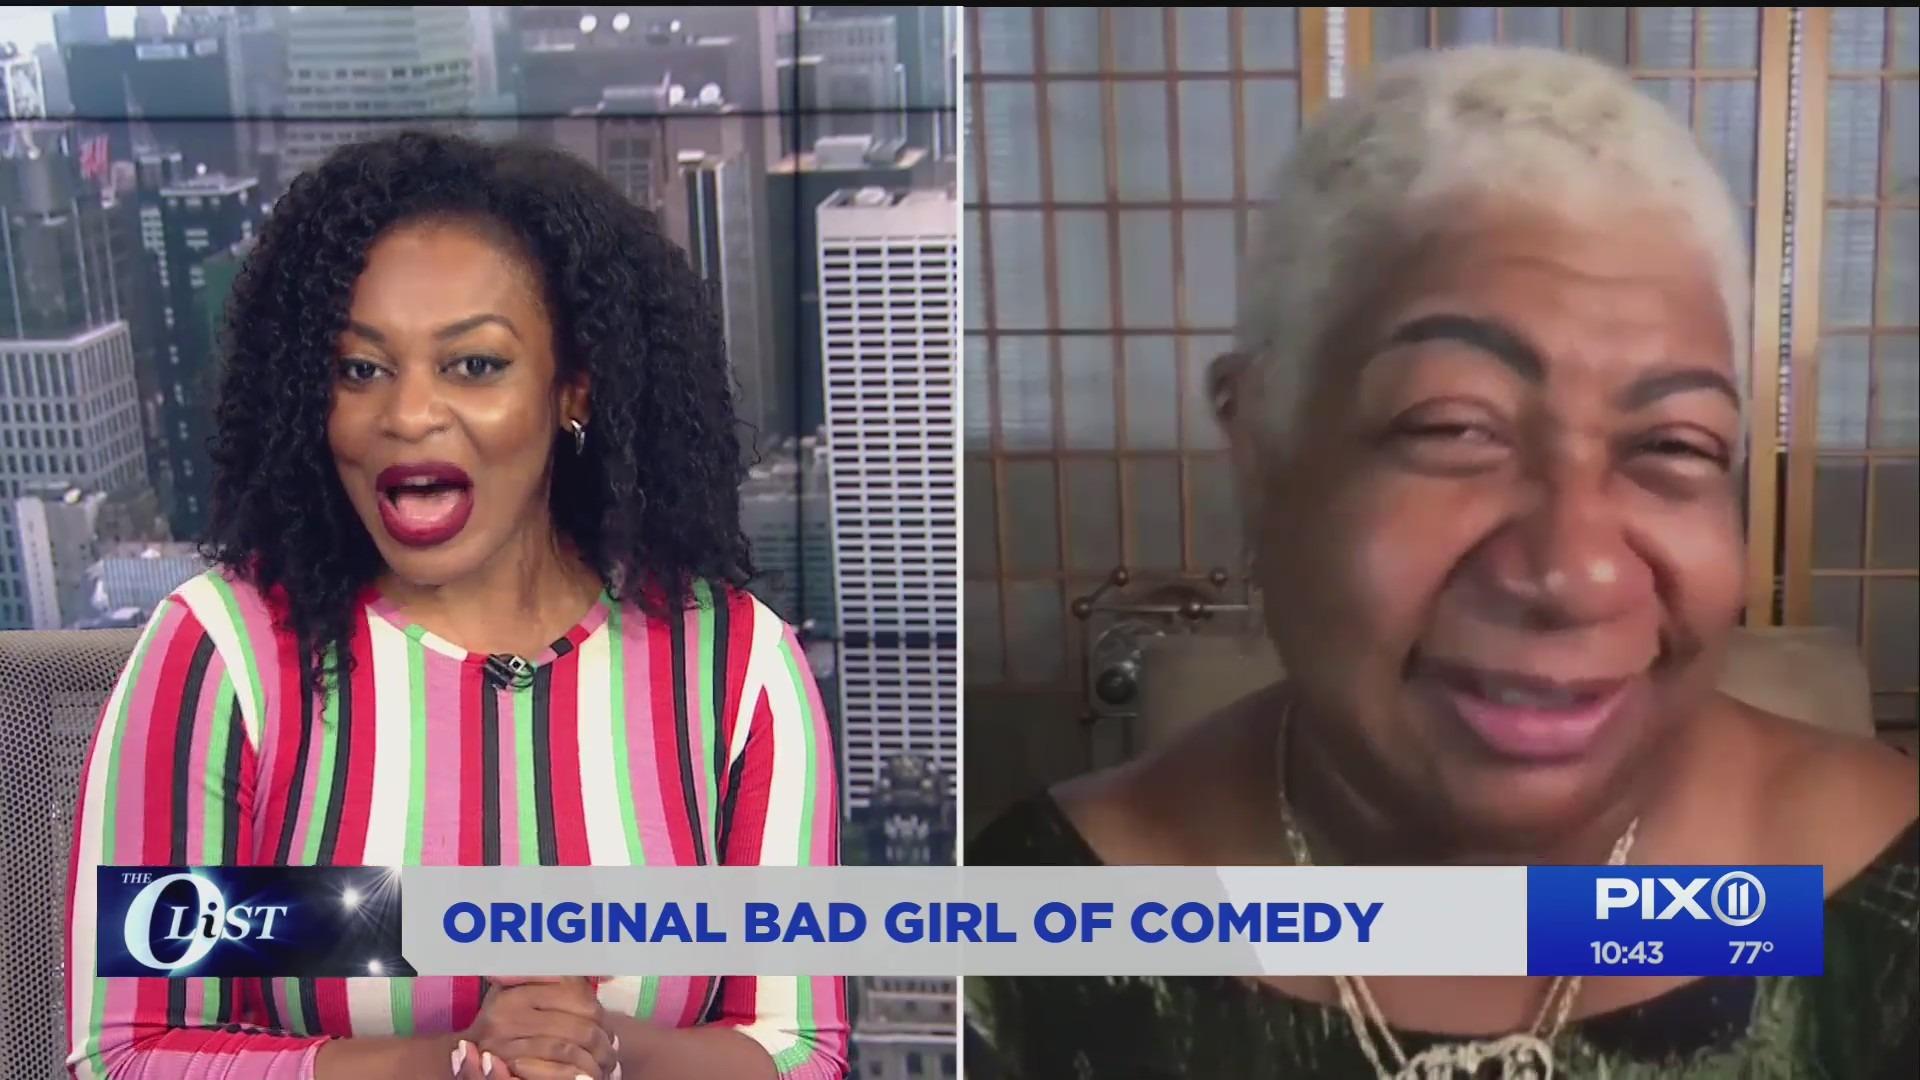 Comedian Luenell on PIX11